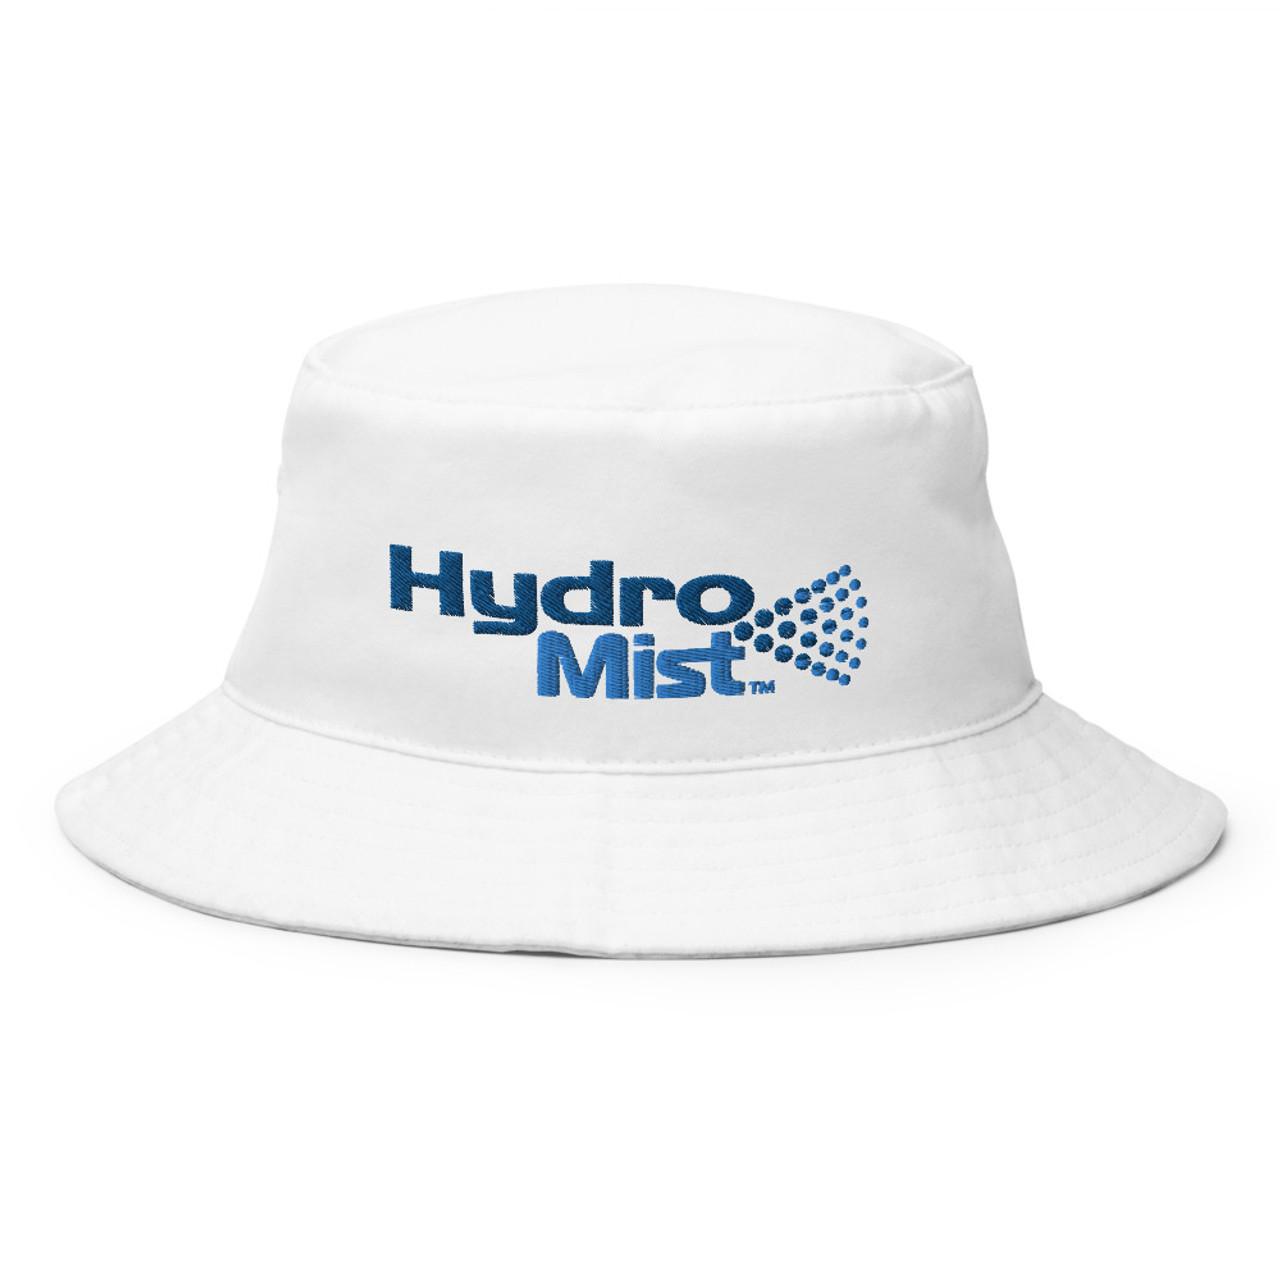 HydroMist Bucket Hat